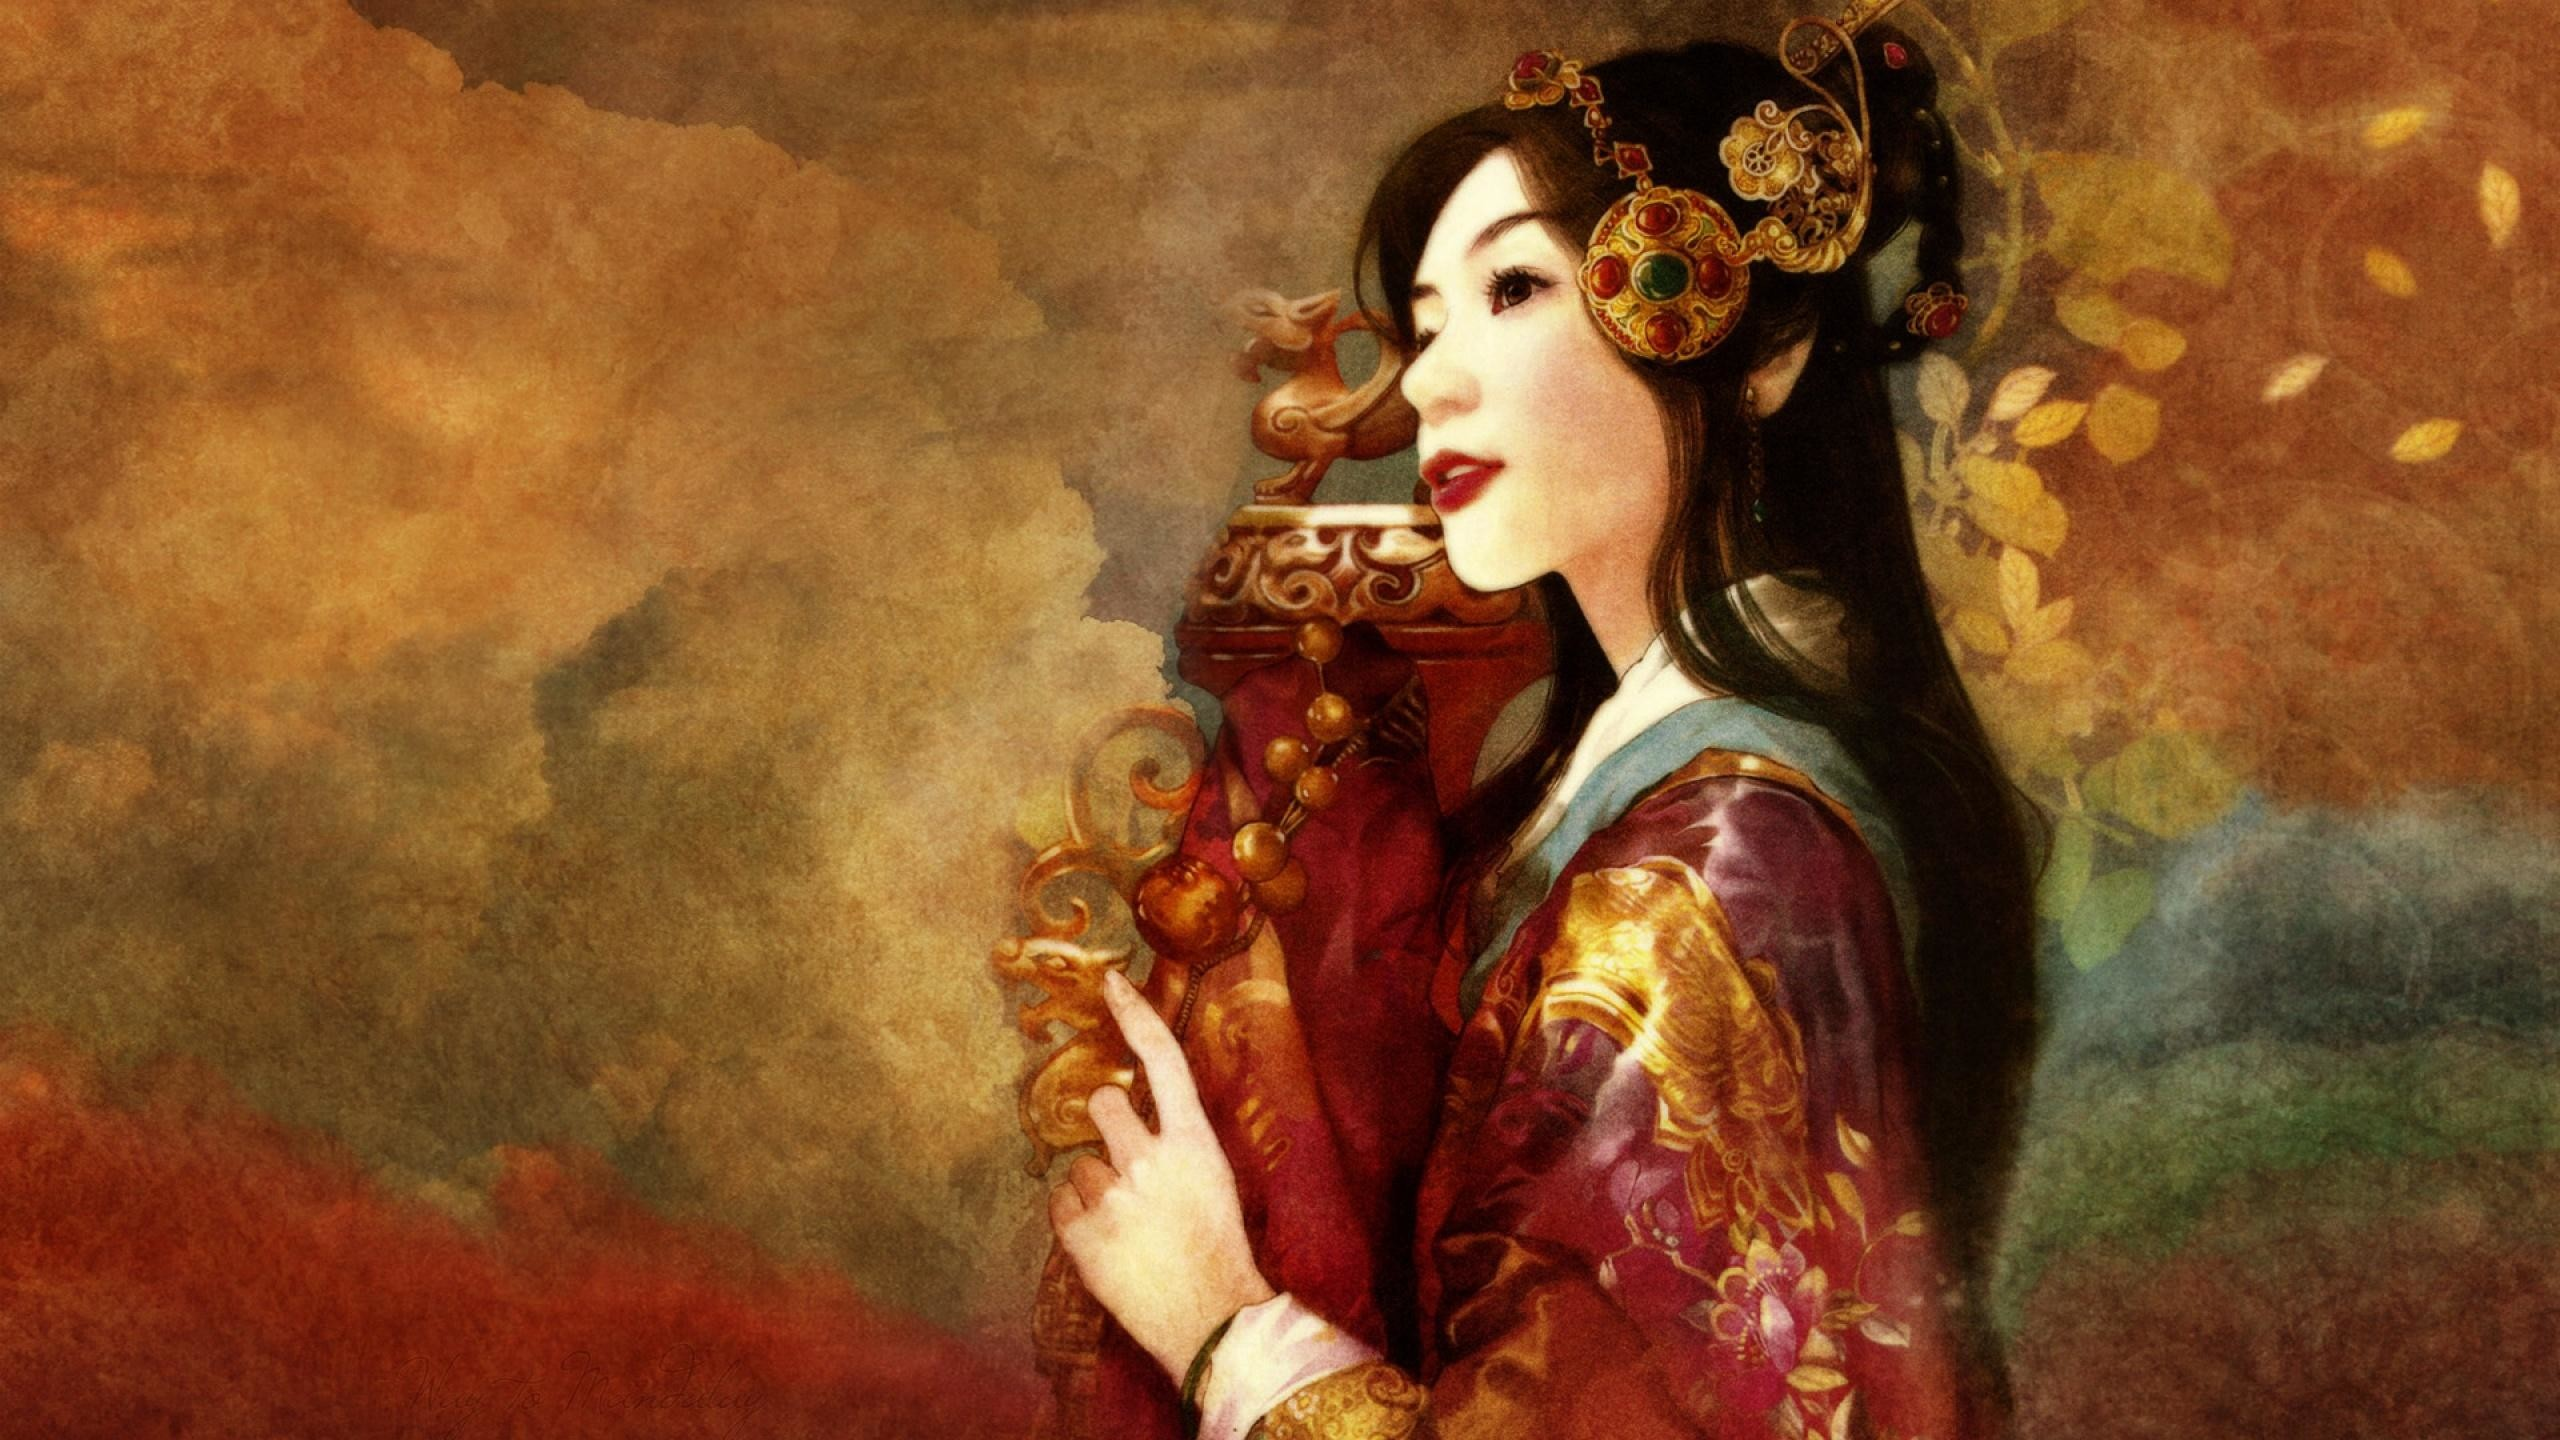 Desktop Images of Asian Asian Wallpapers Asian Wallpaper Wallpapers)